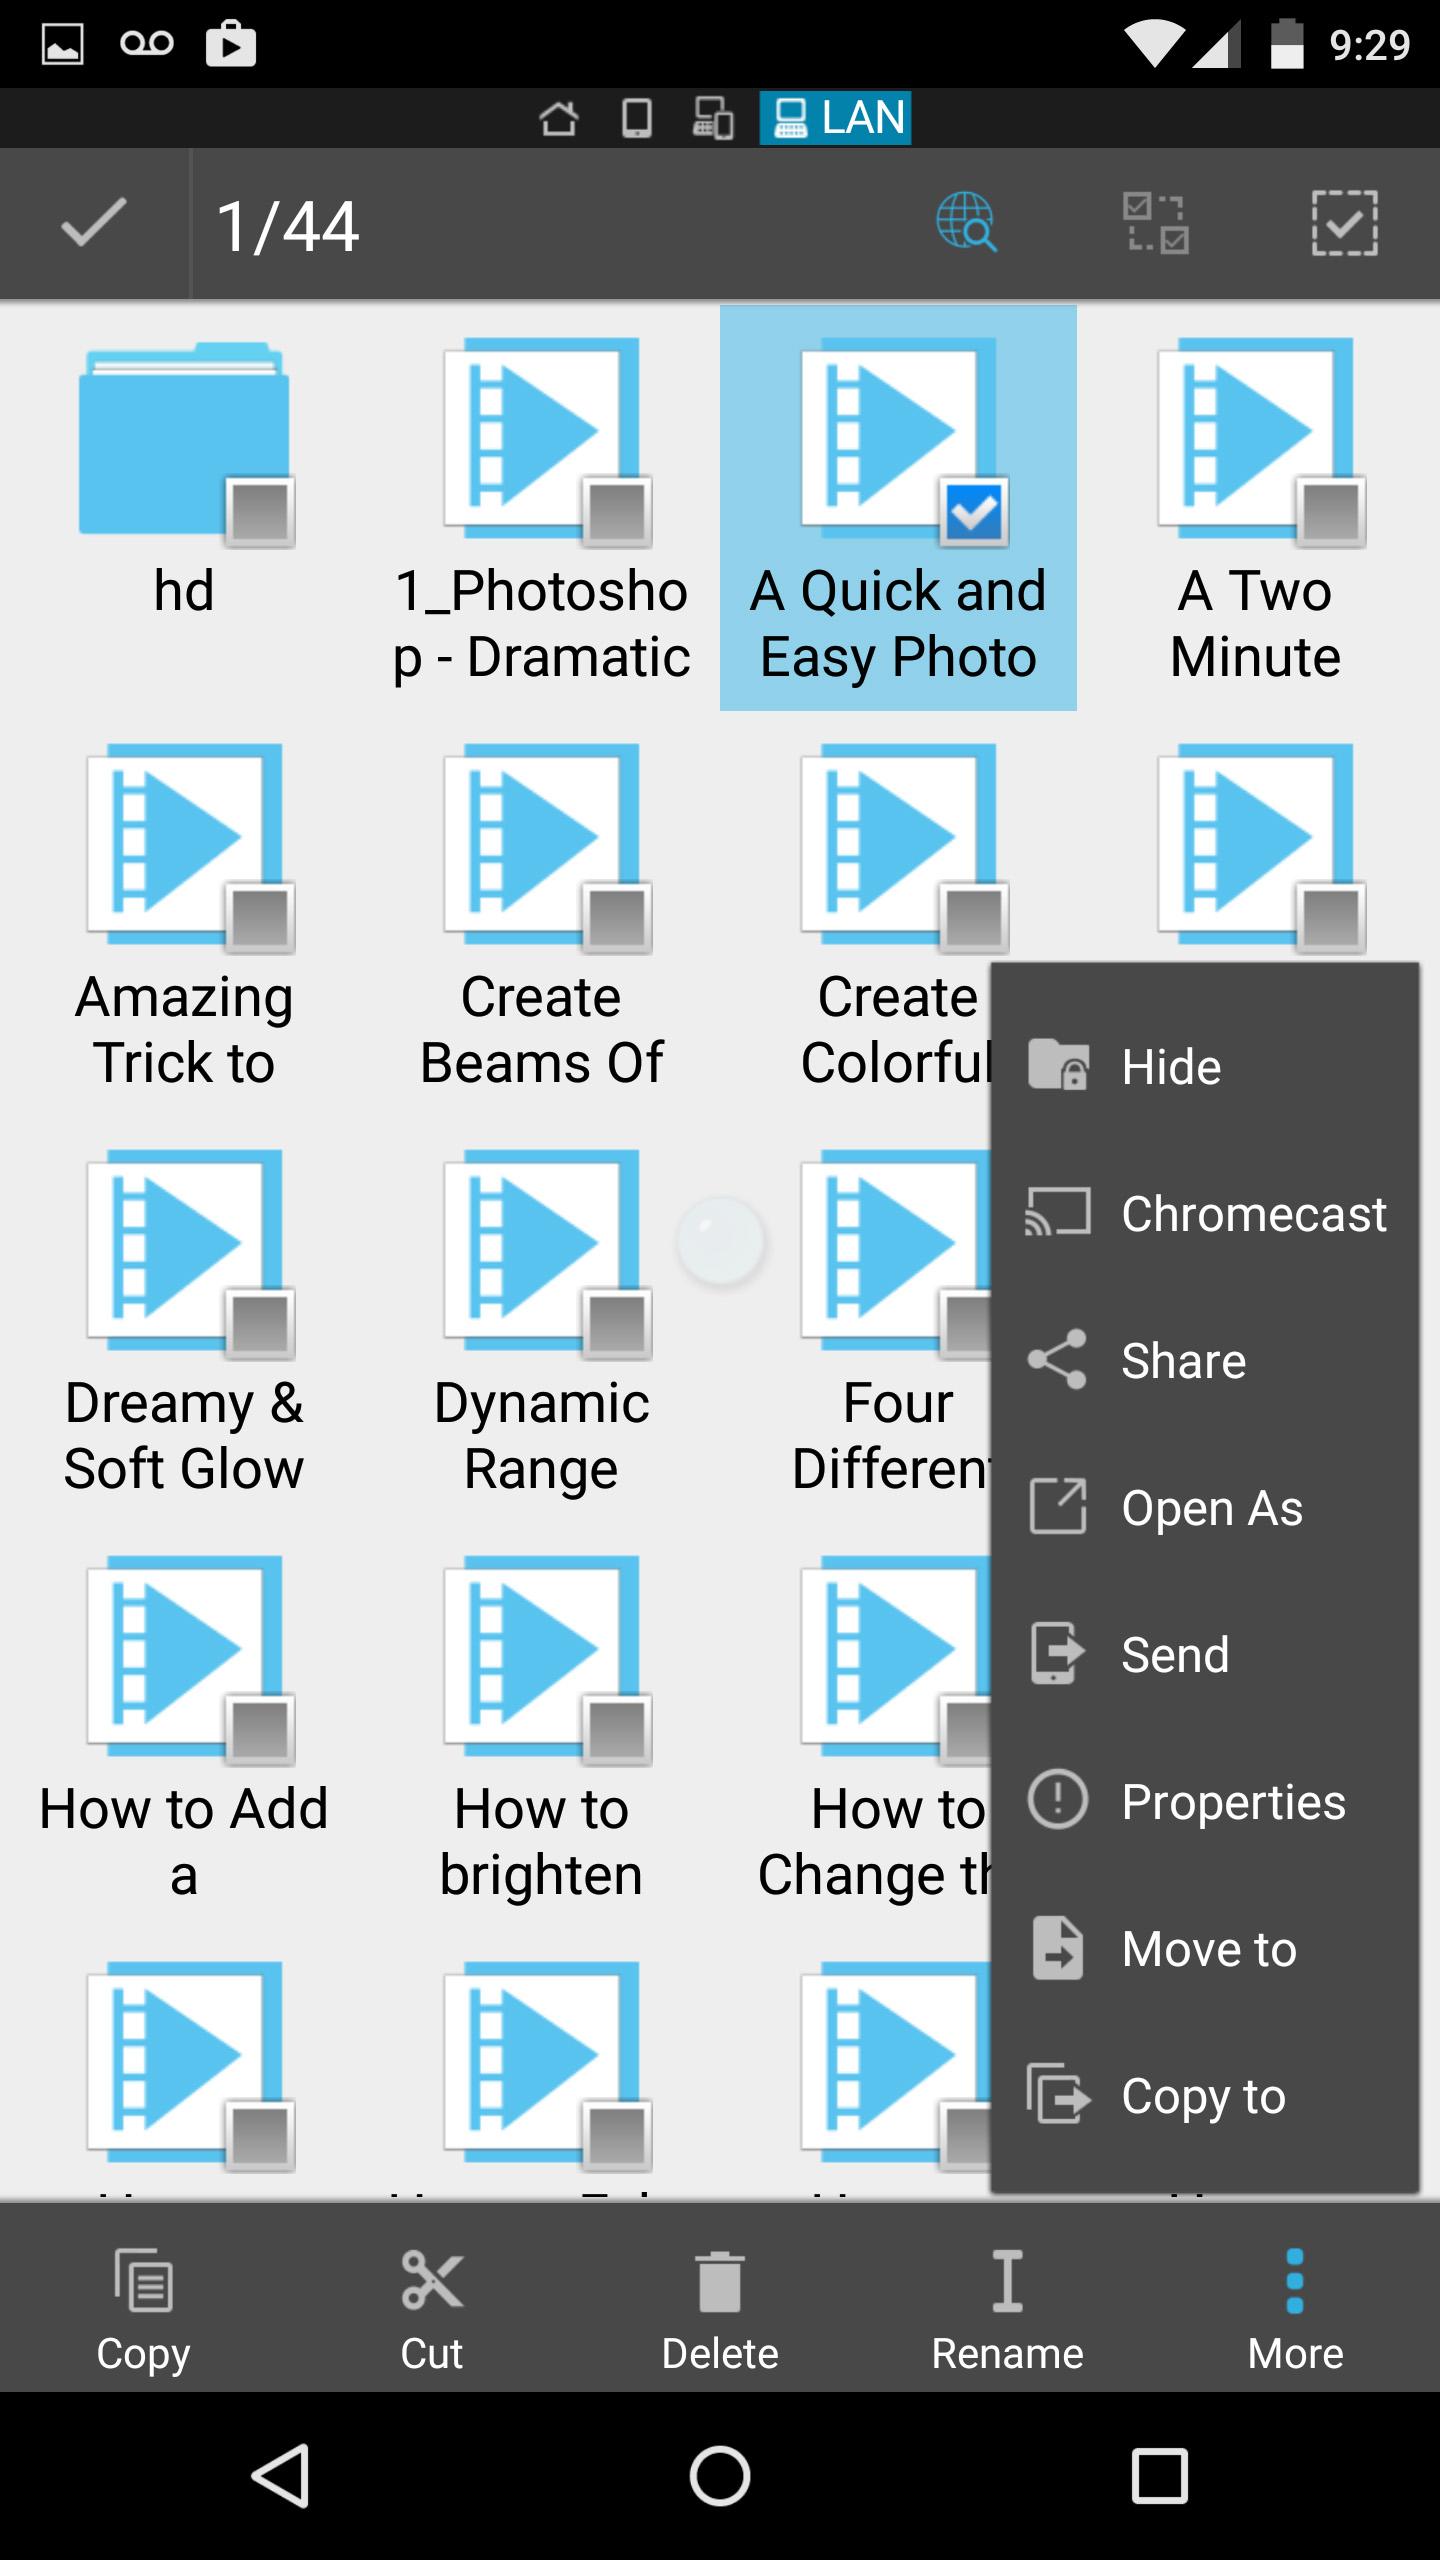 chromecast file selection